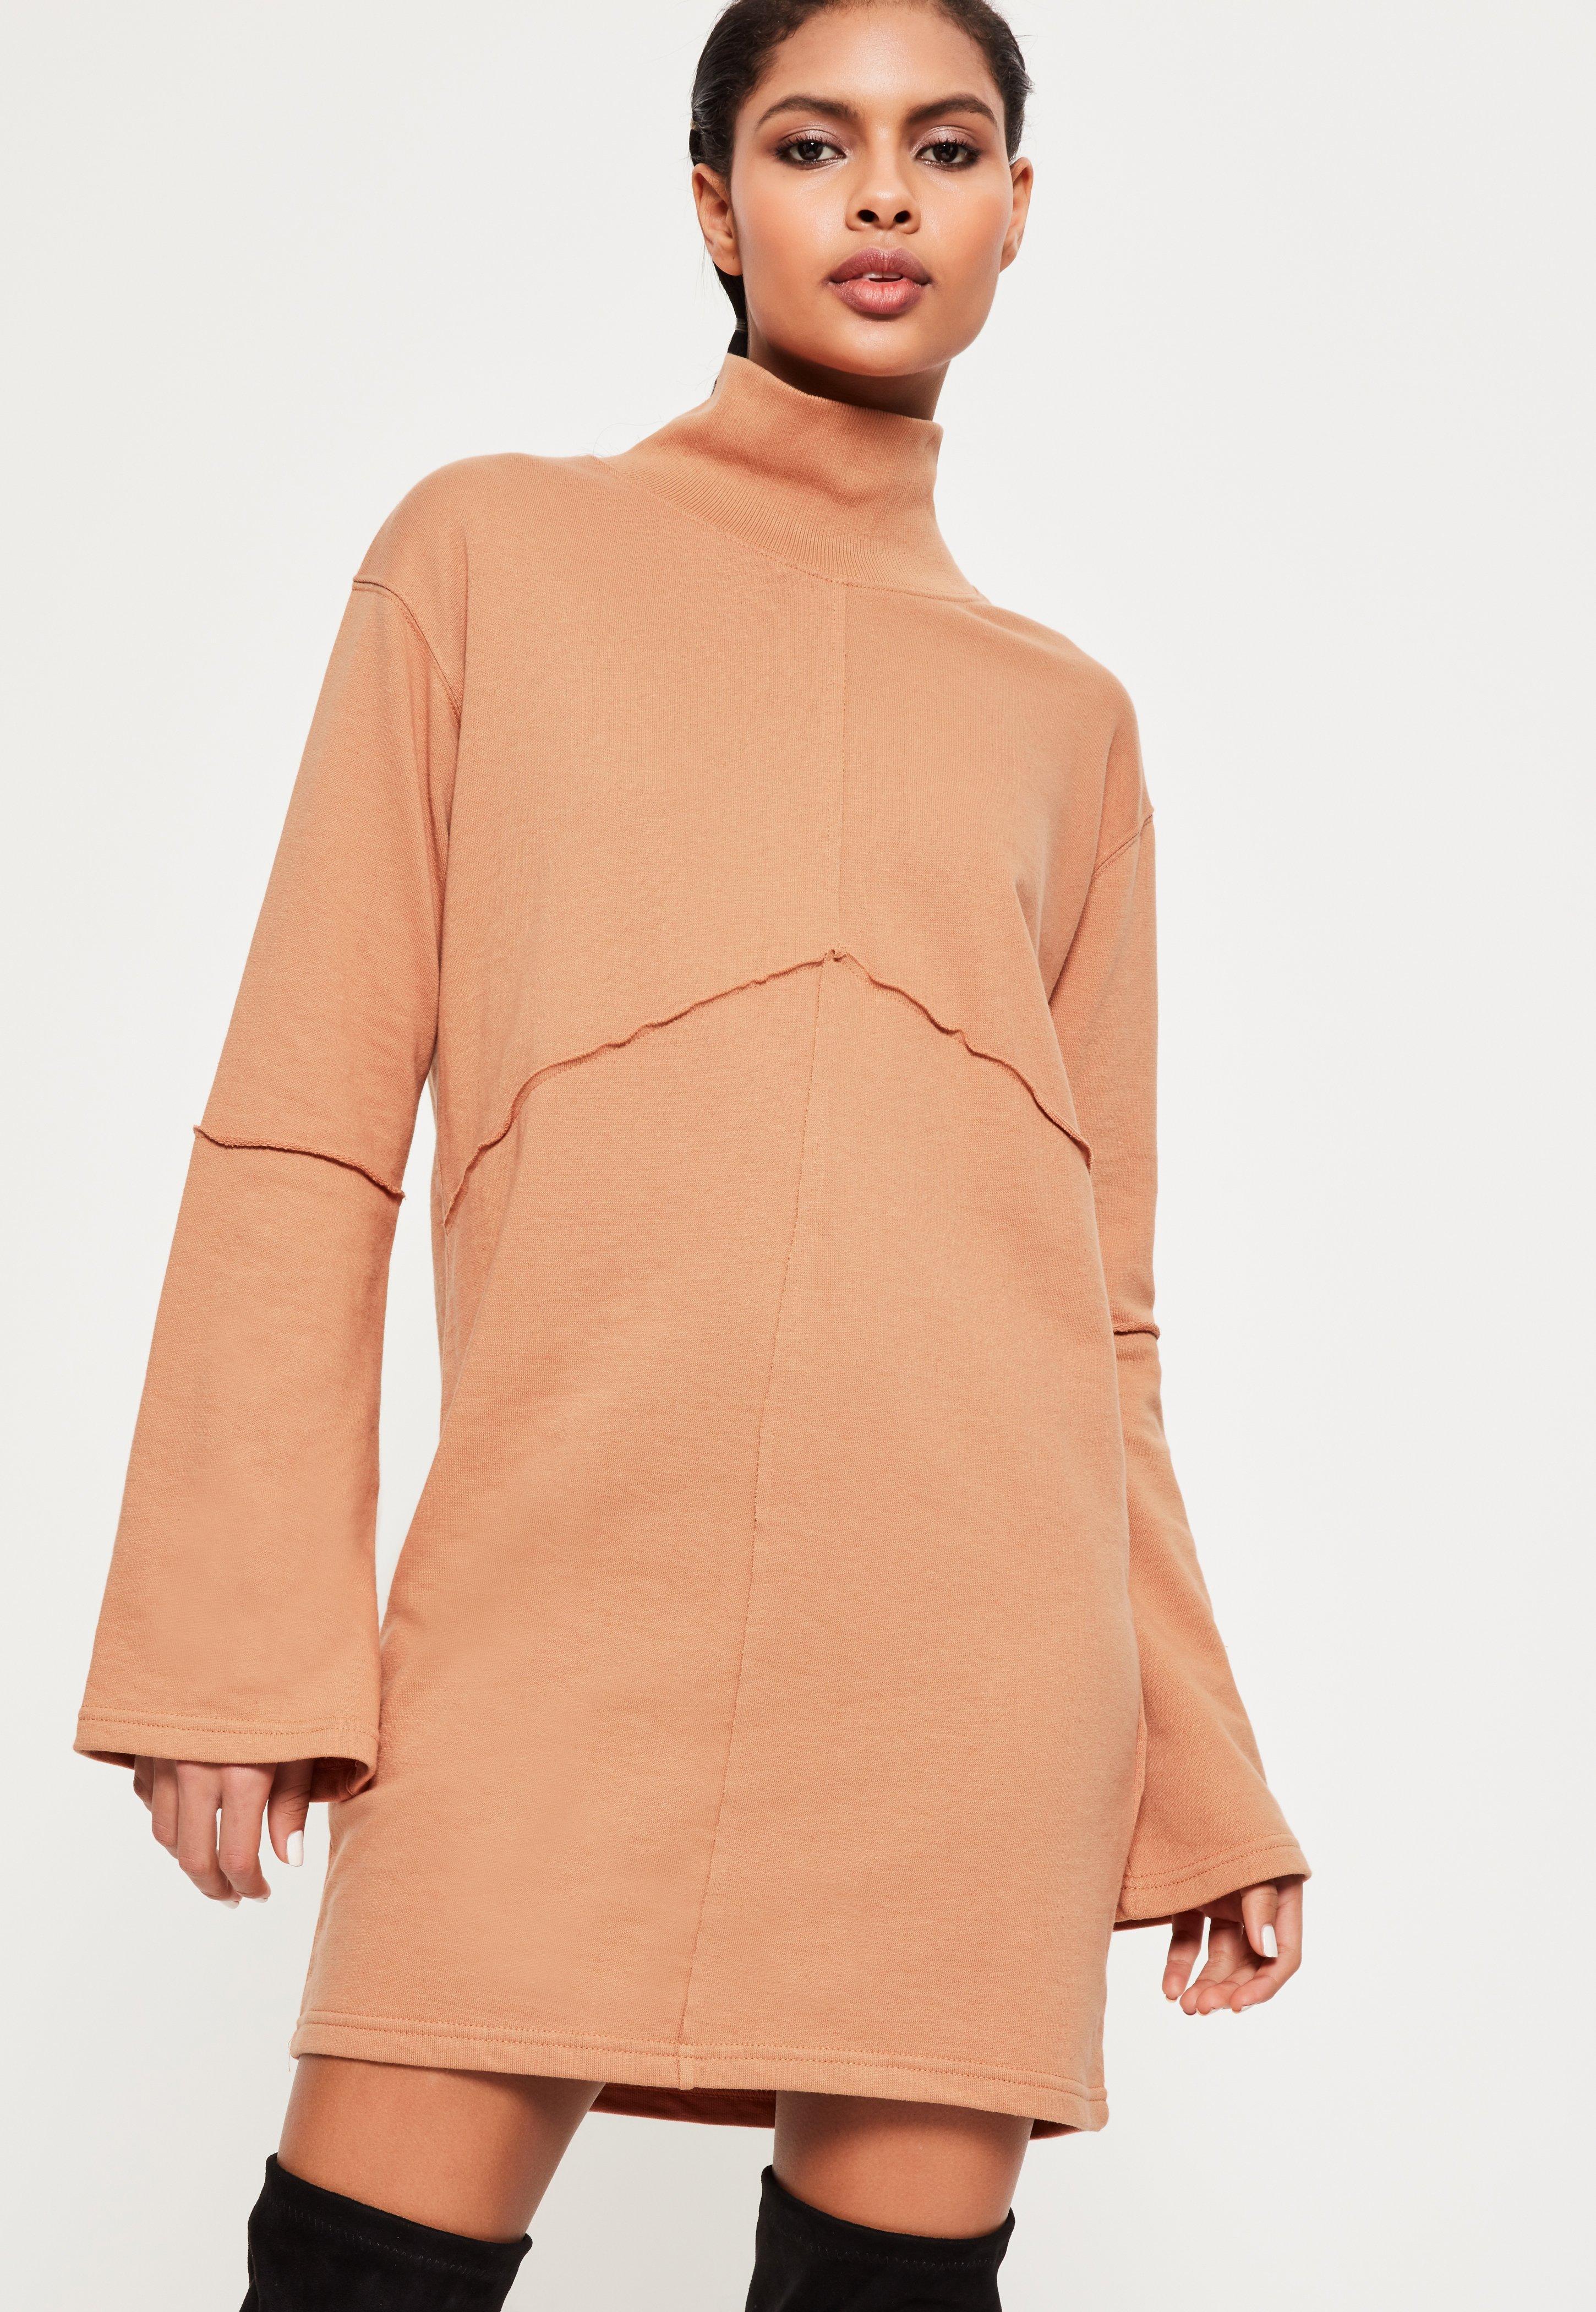 Nude Flared Sleeve Dress